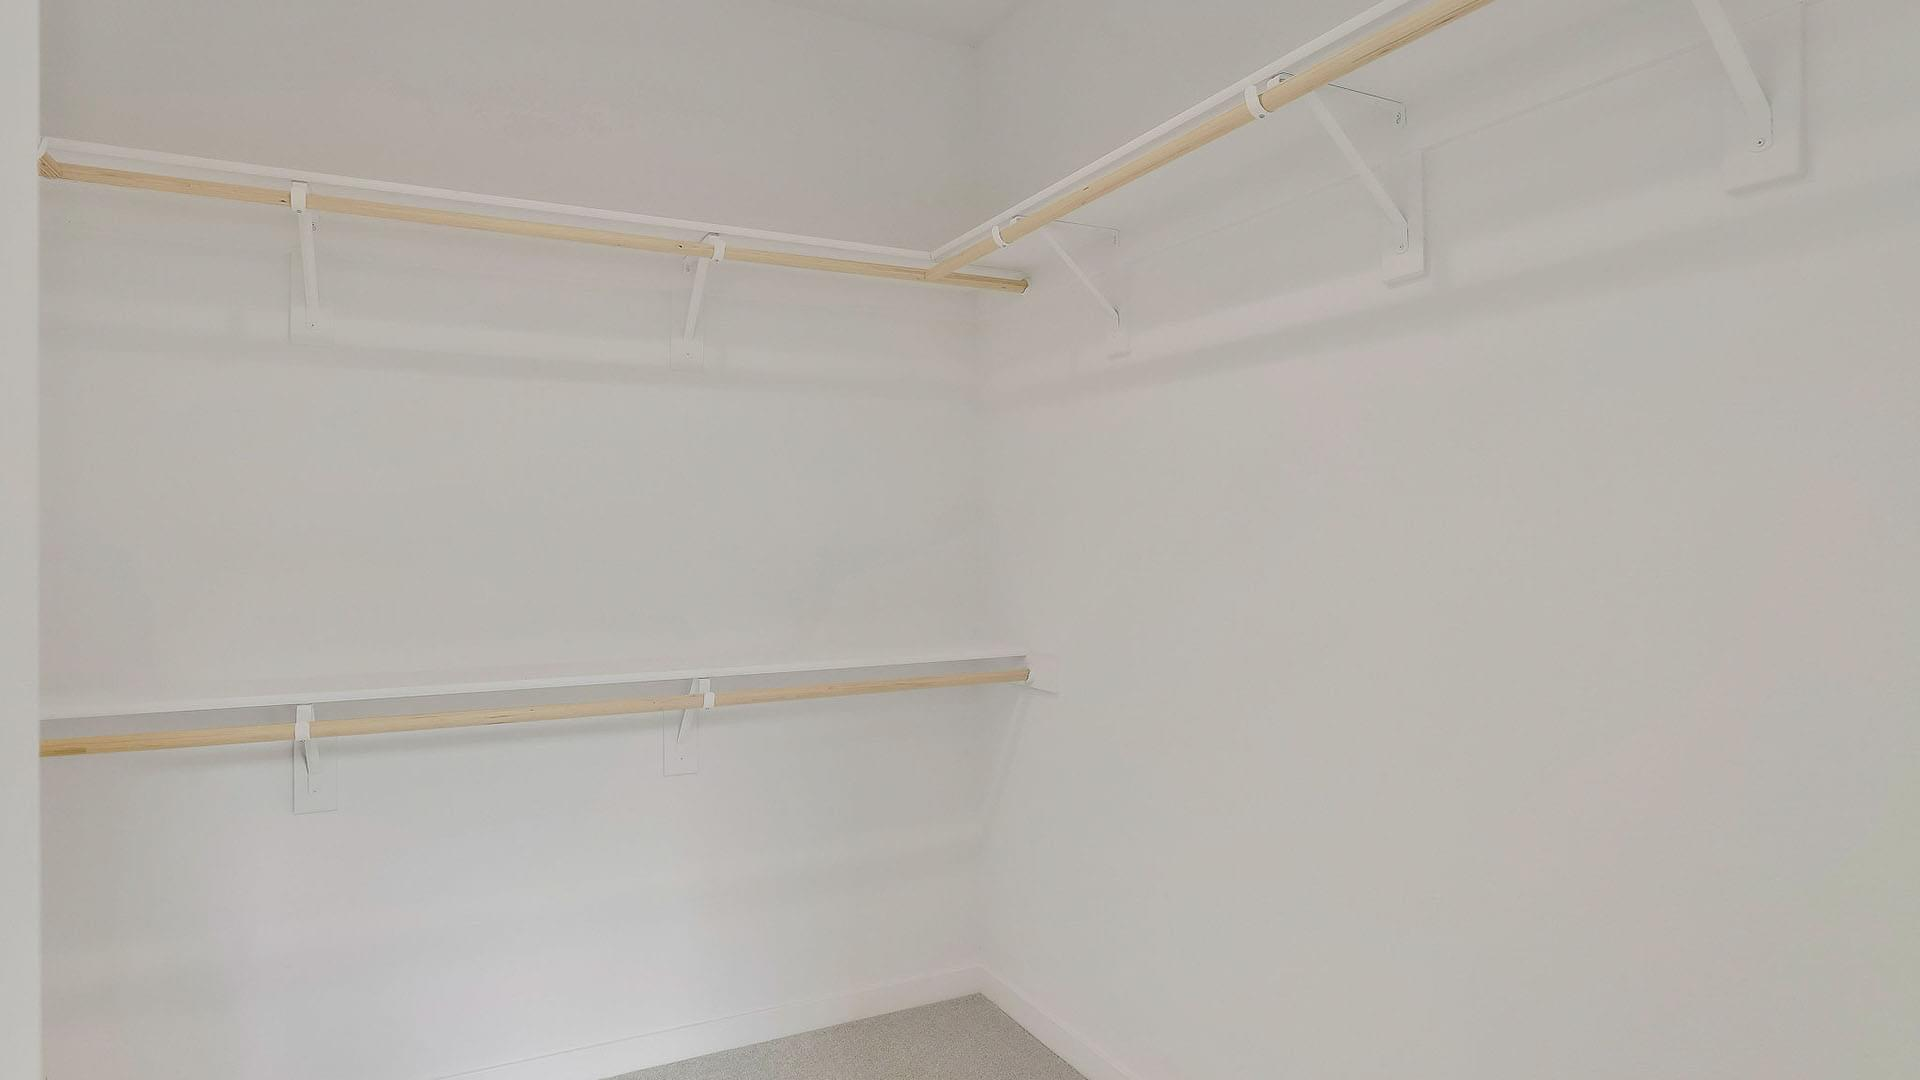 Residence 1 Master Walk-In Closet